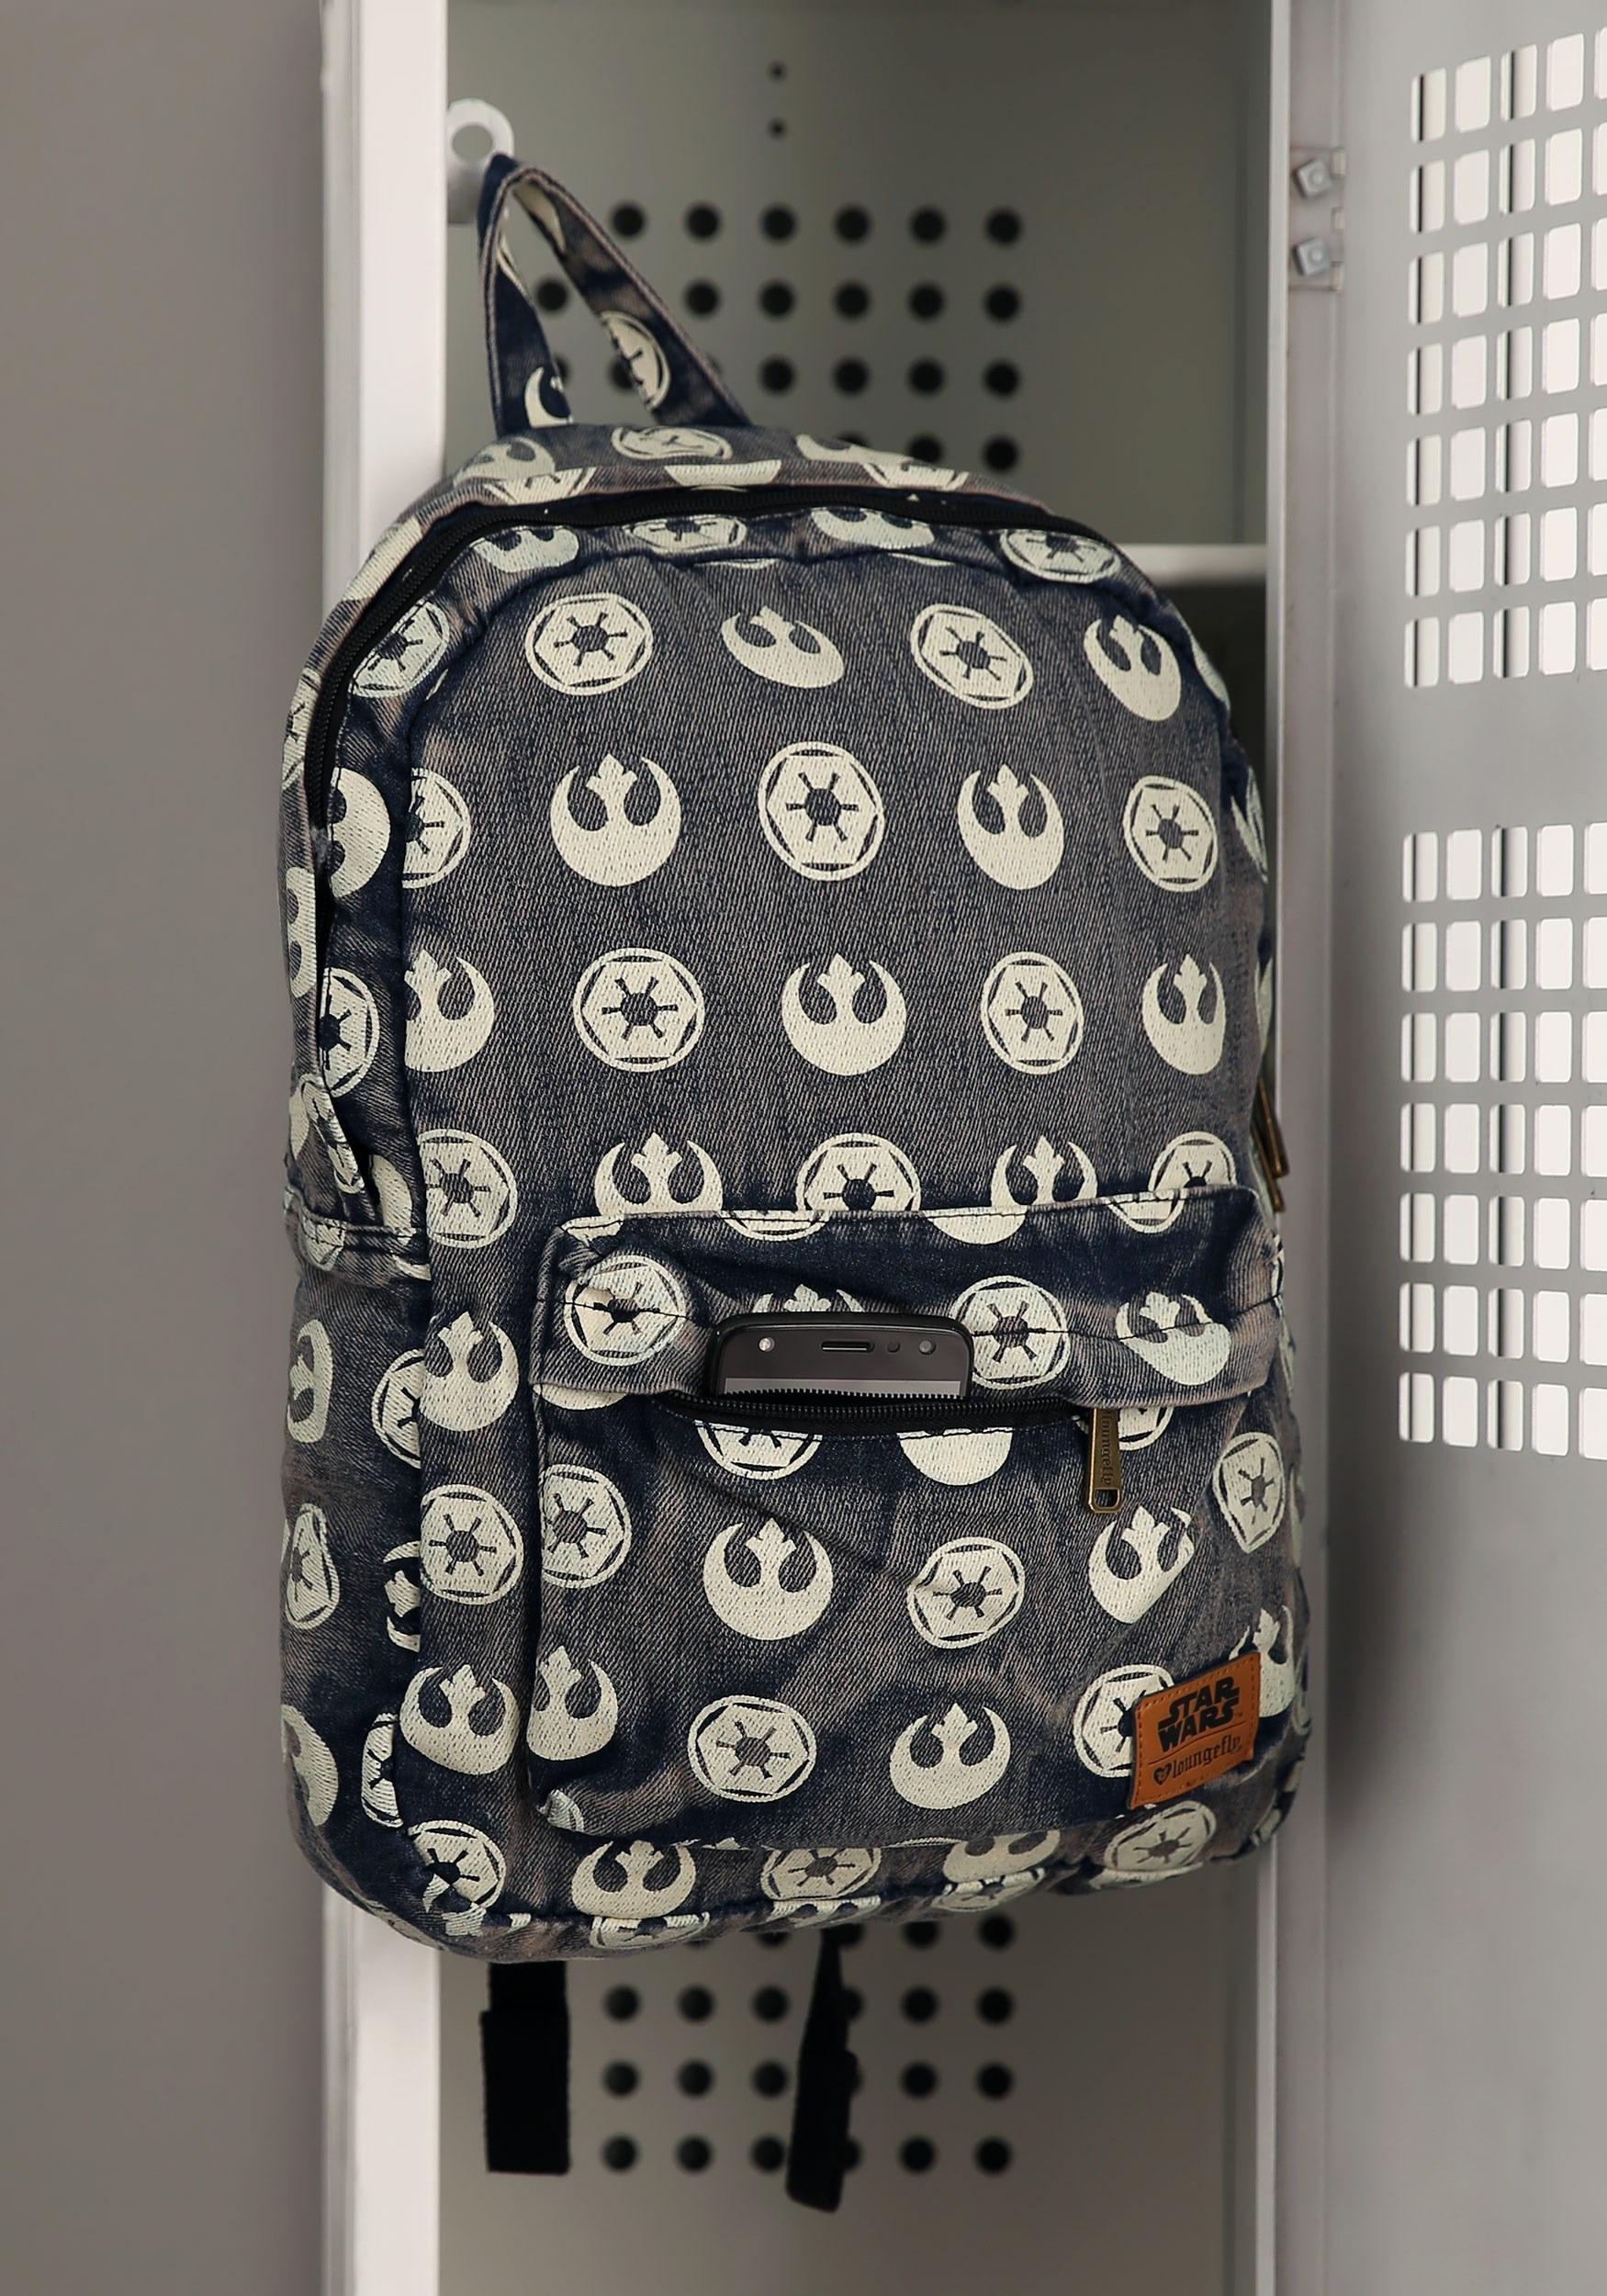 Star Wars Rebels Backpack Kids Bag